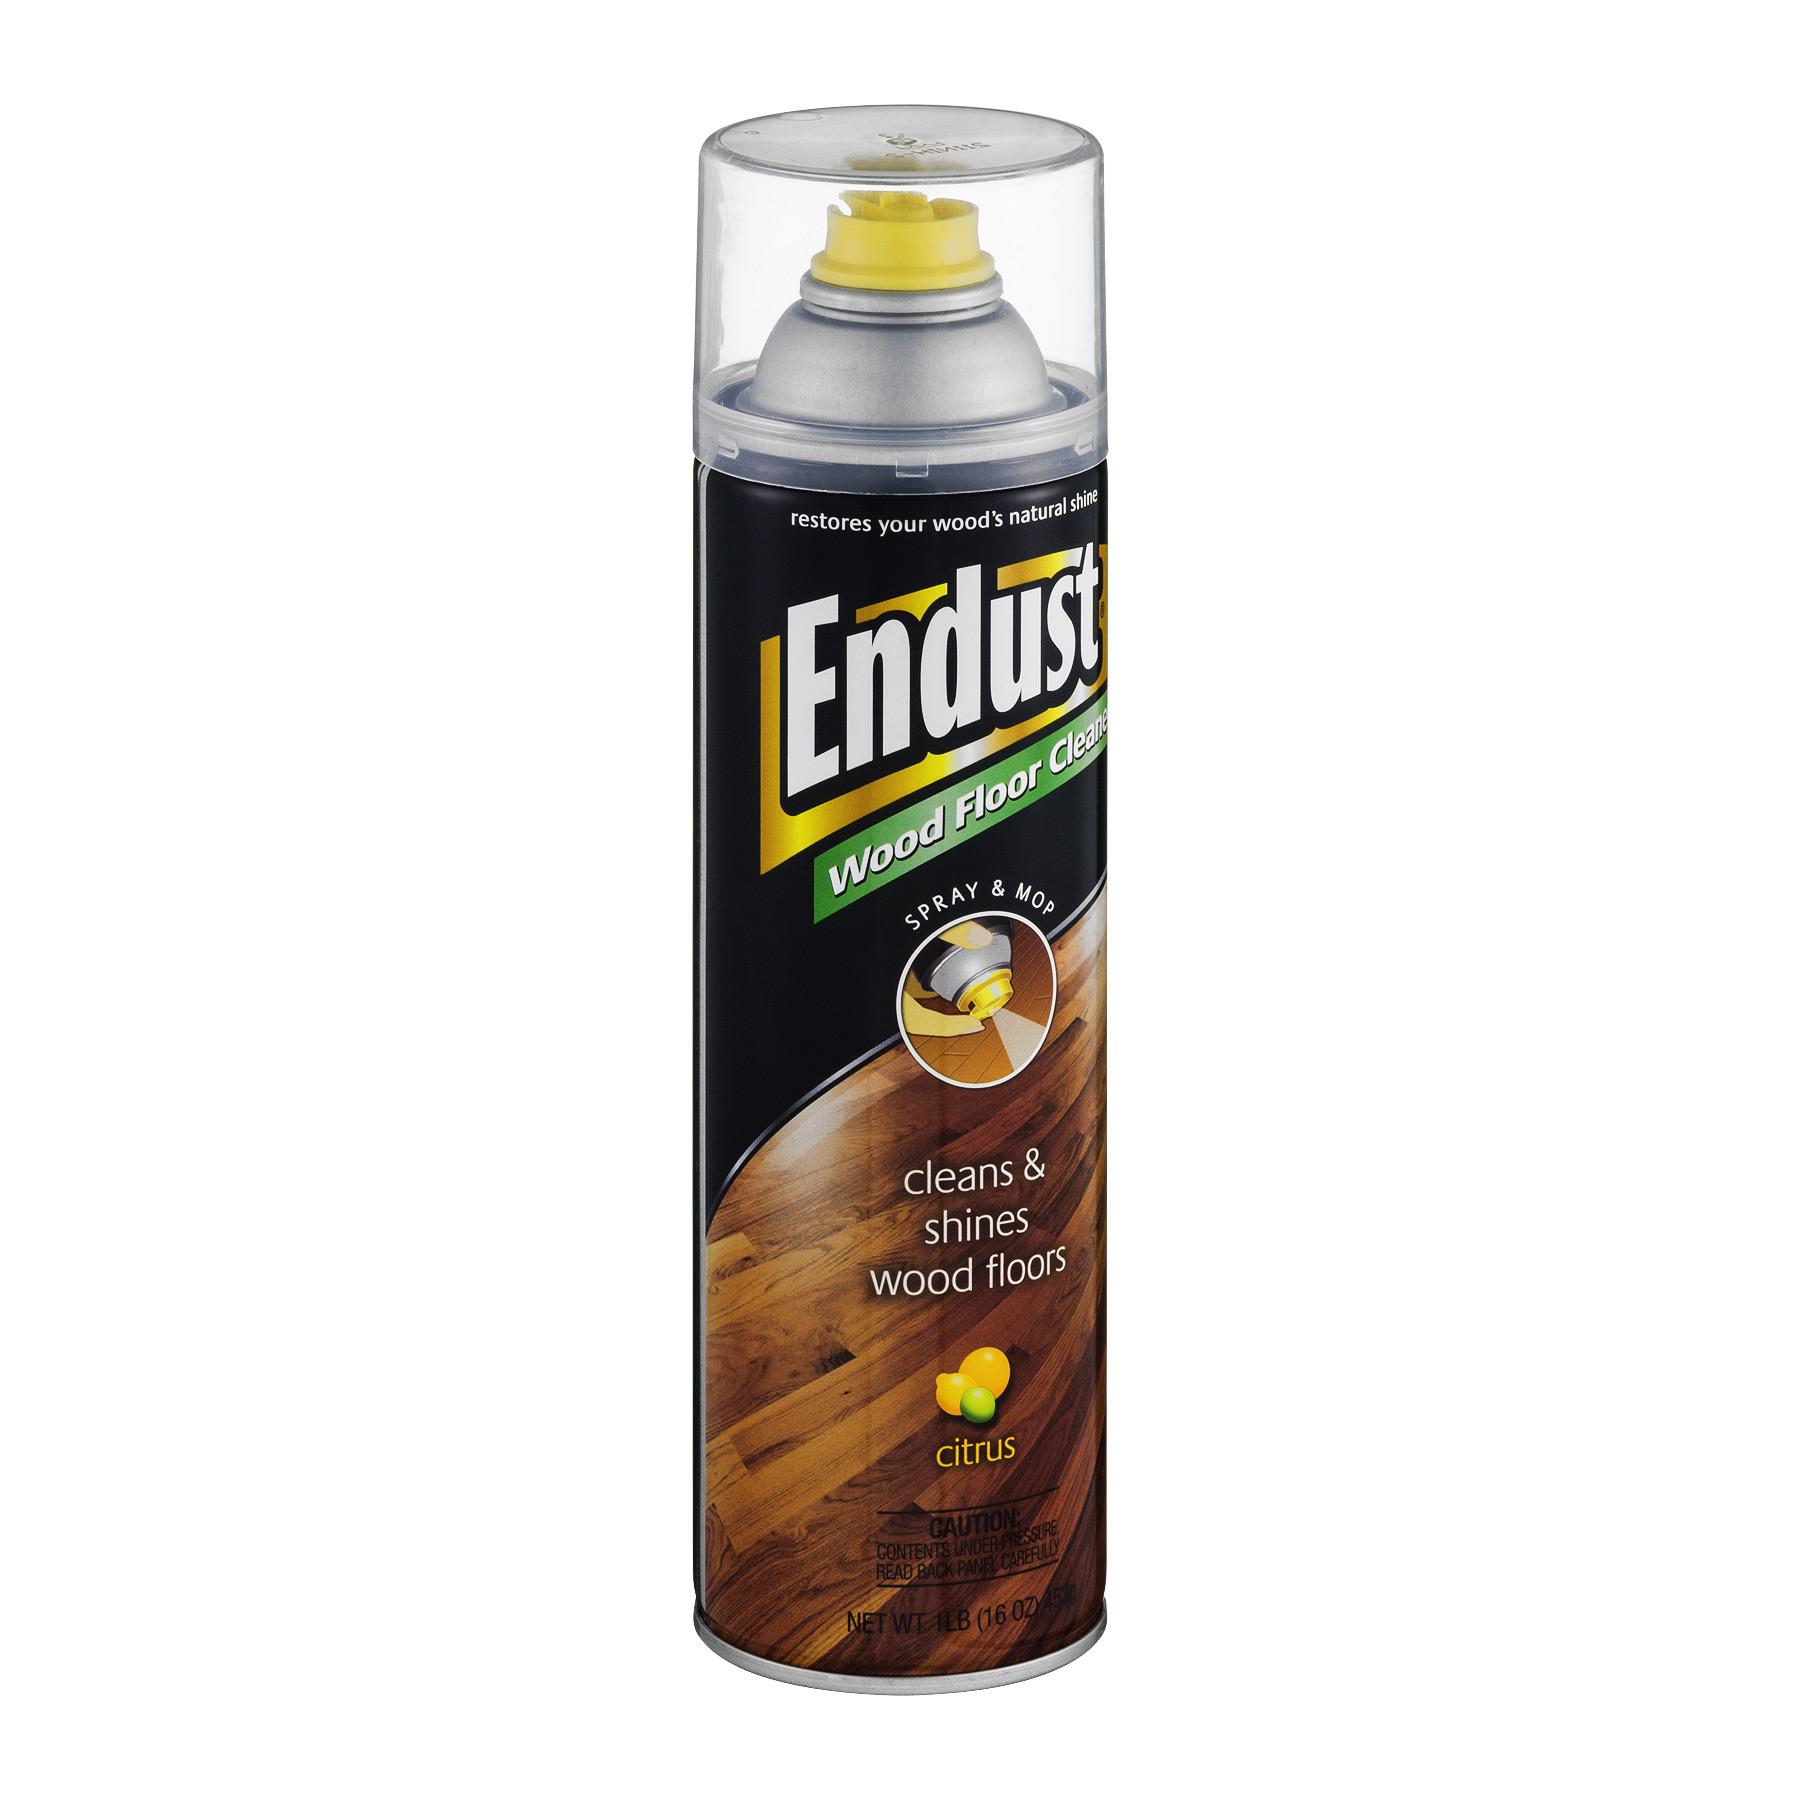 hardwood floor cleaner reviews of endust citrus wood floor cleaner 16 oz walmart com within 6aa82809 ebe2 408e bdd2 c187658772c5 1 8ed41dfe4c578f8c36683d60de60209a